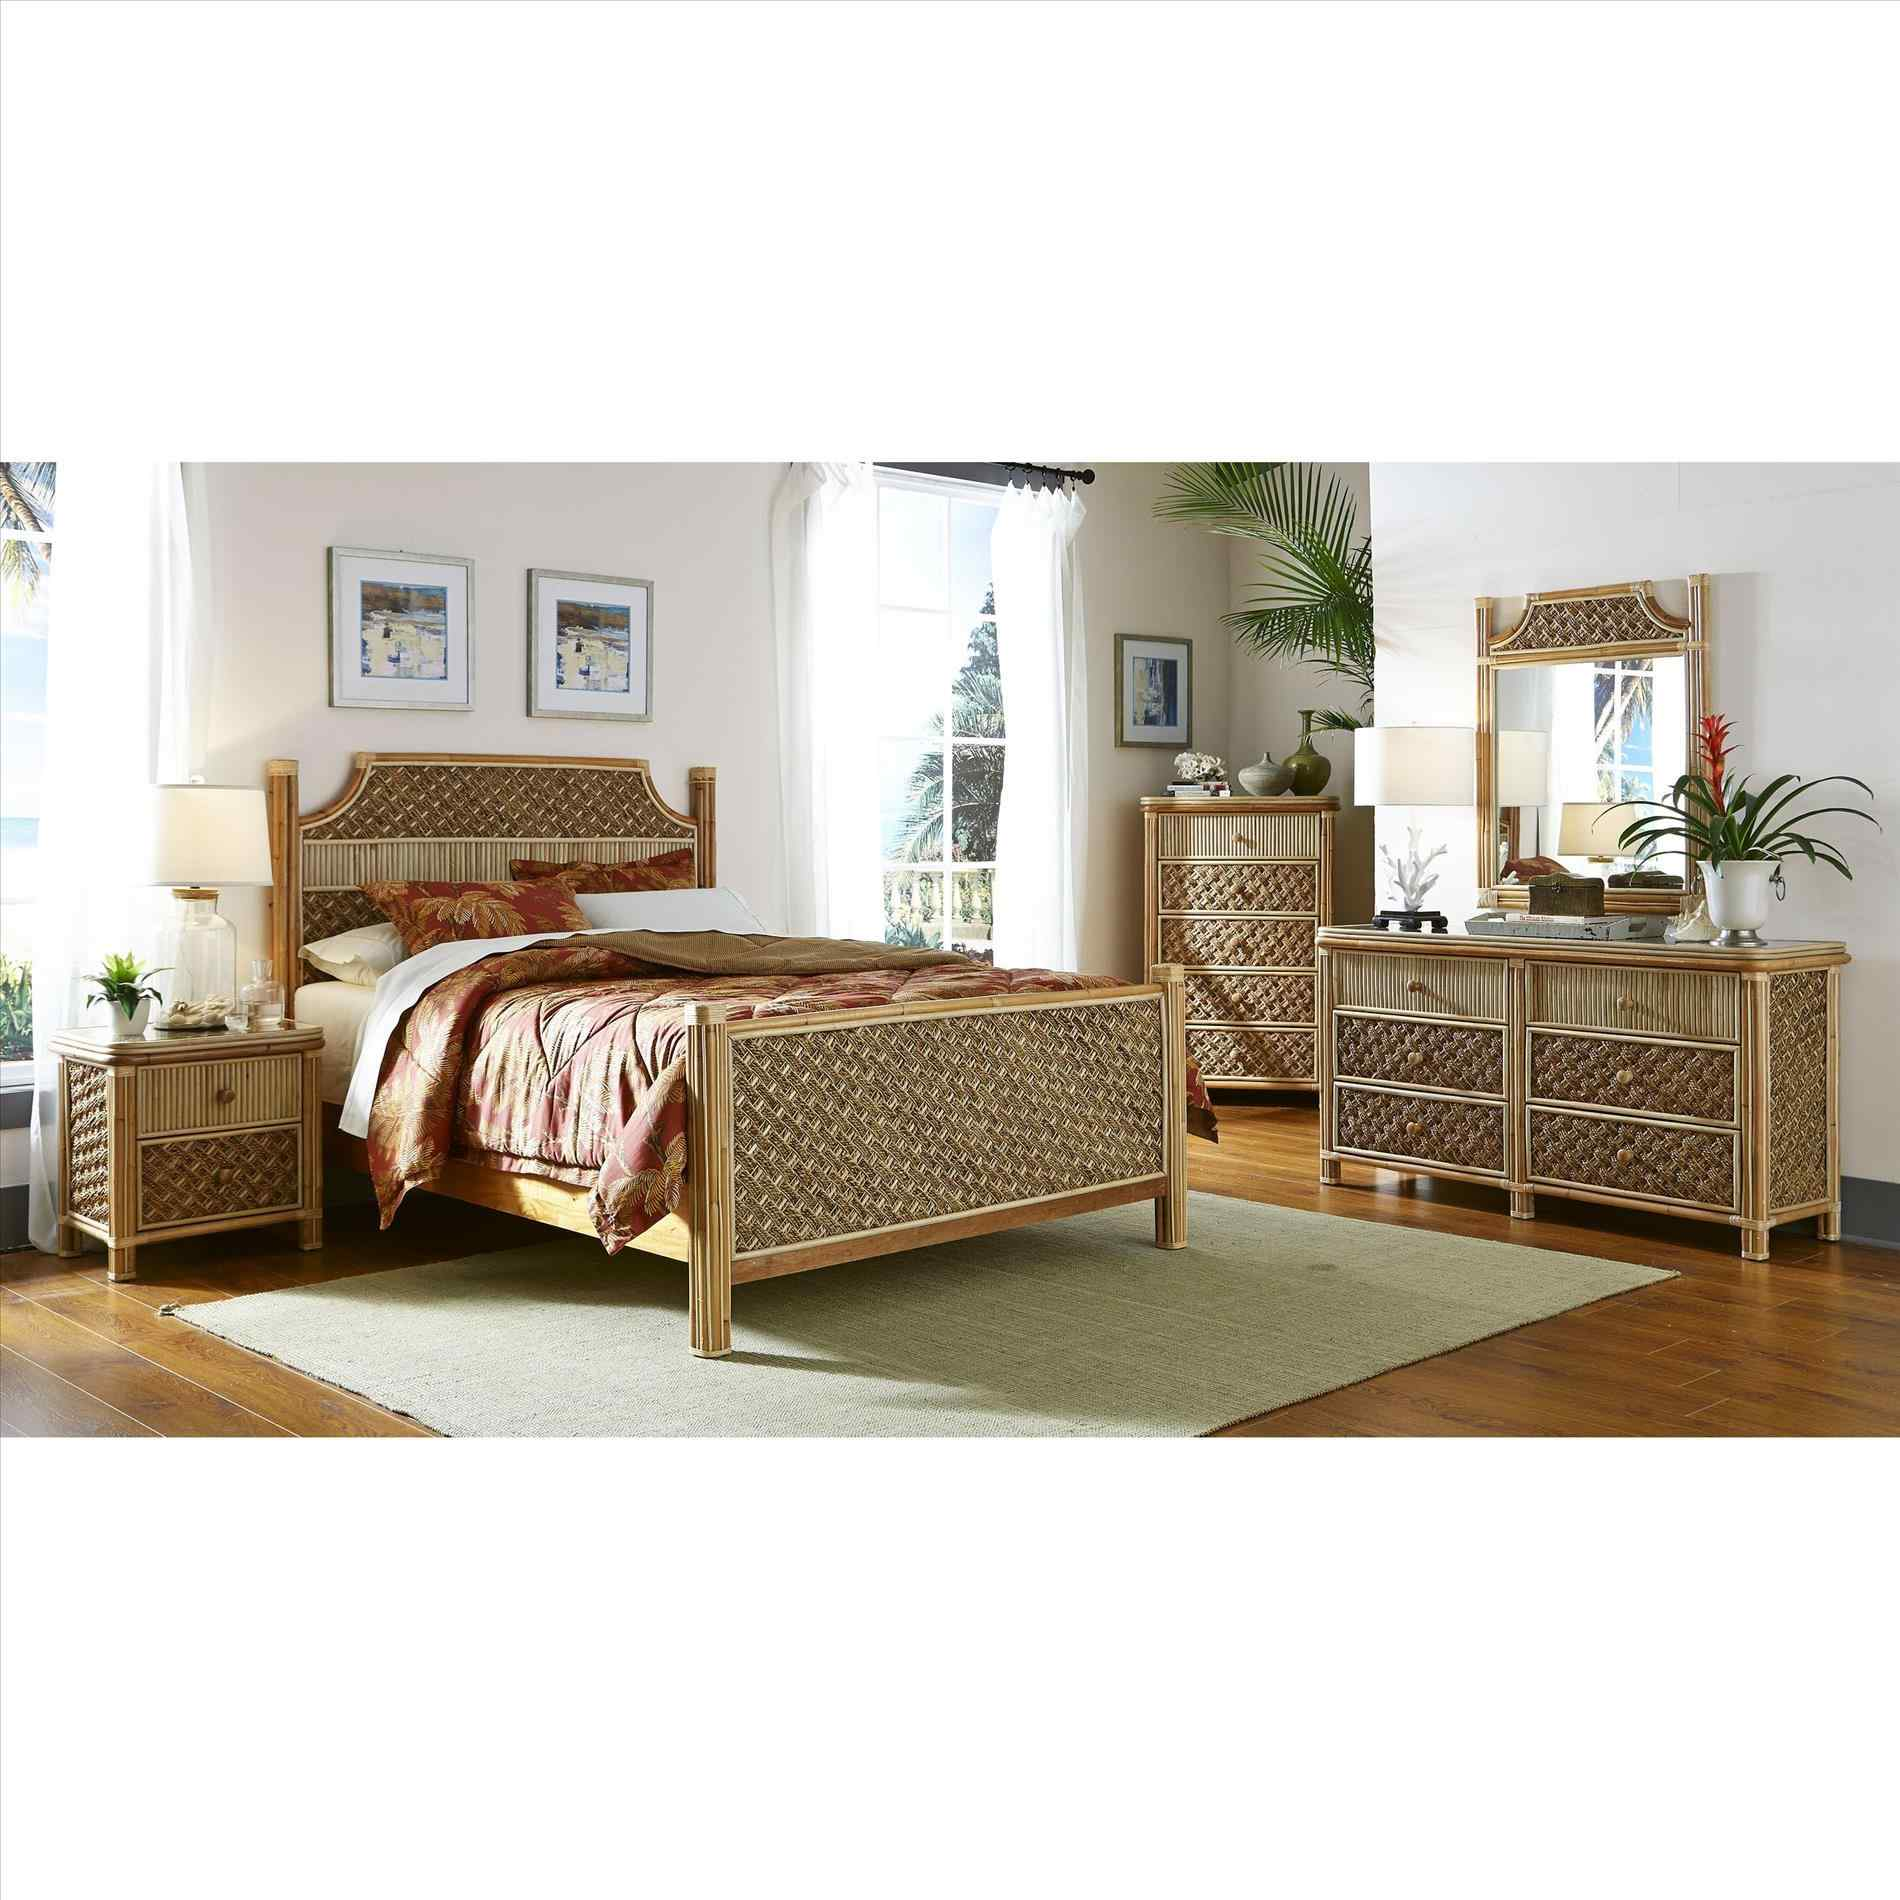 black rattan bedroom furniture photo - 6